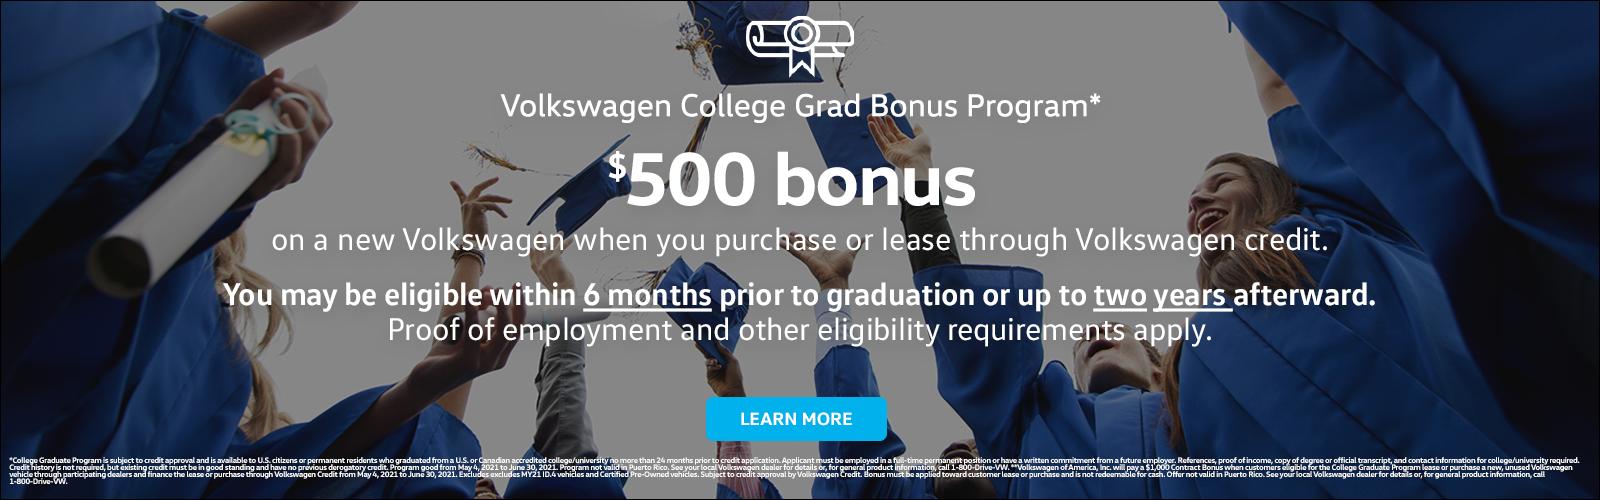 NER College Grad_500 dollar